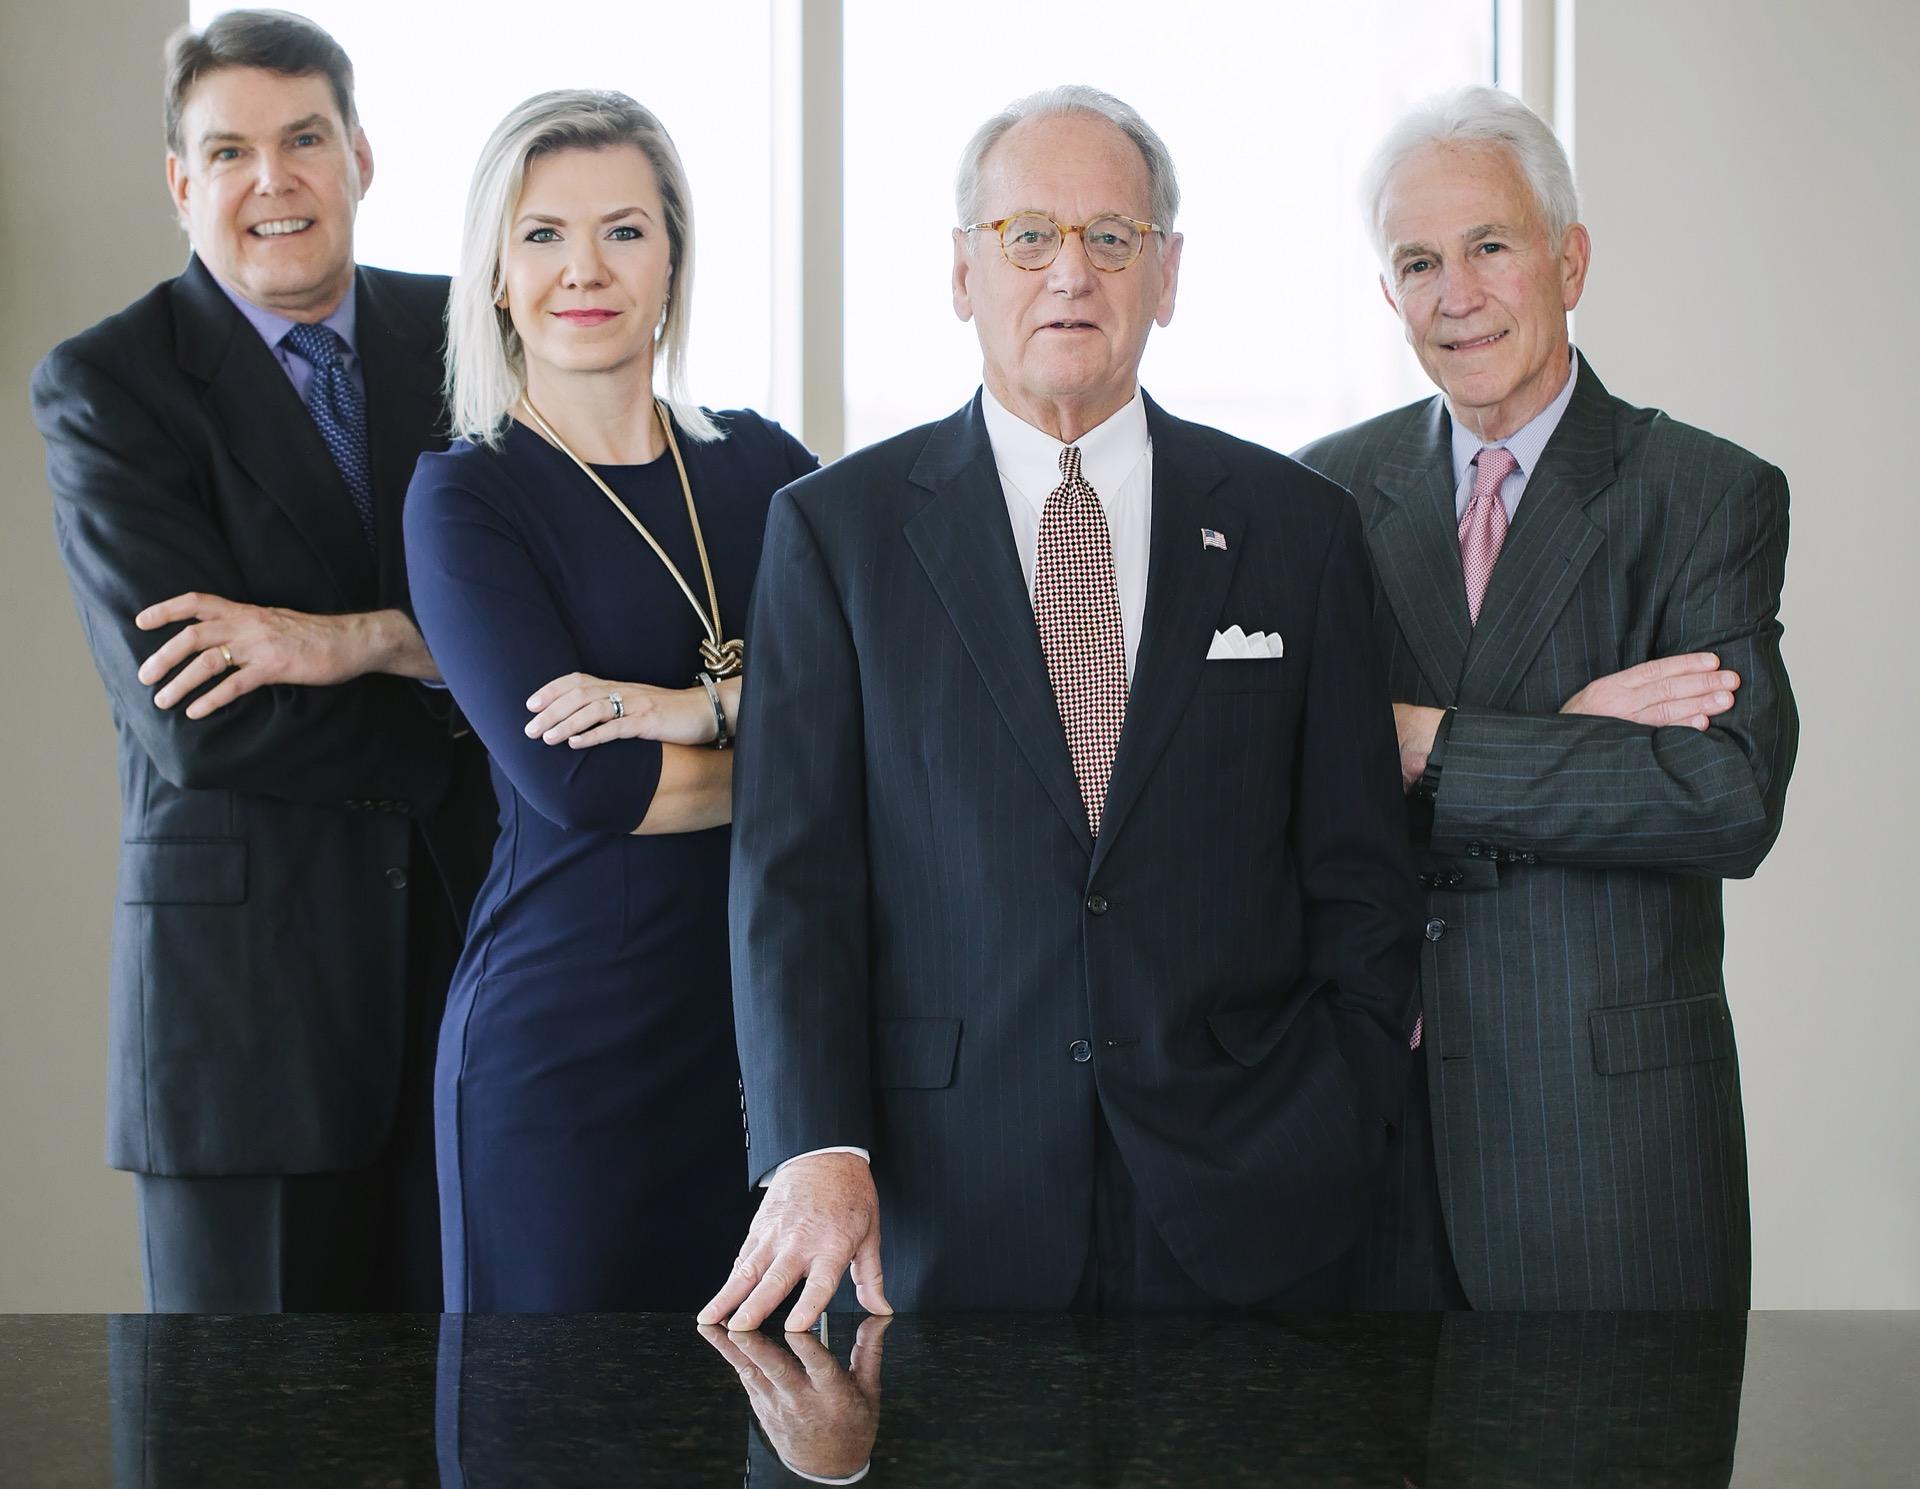 Telos Capital Advisors - group photo